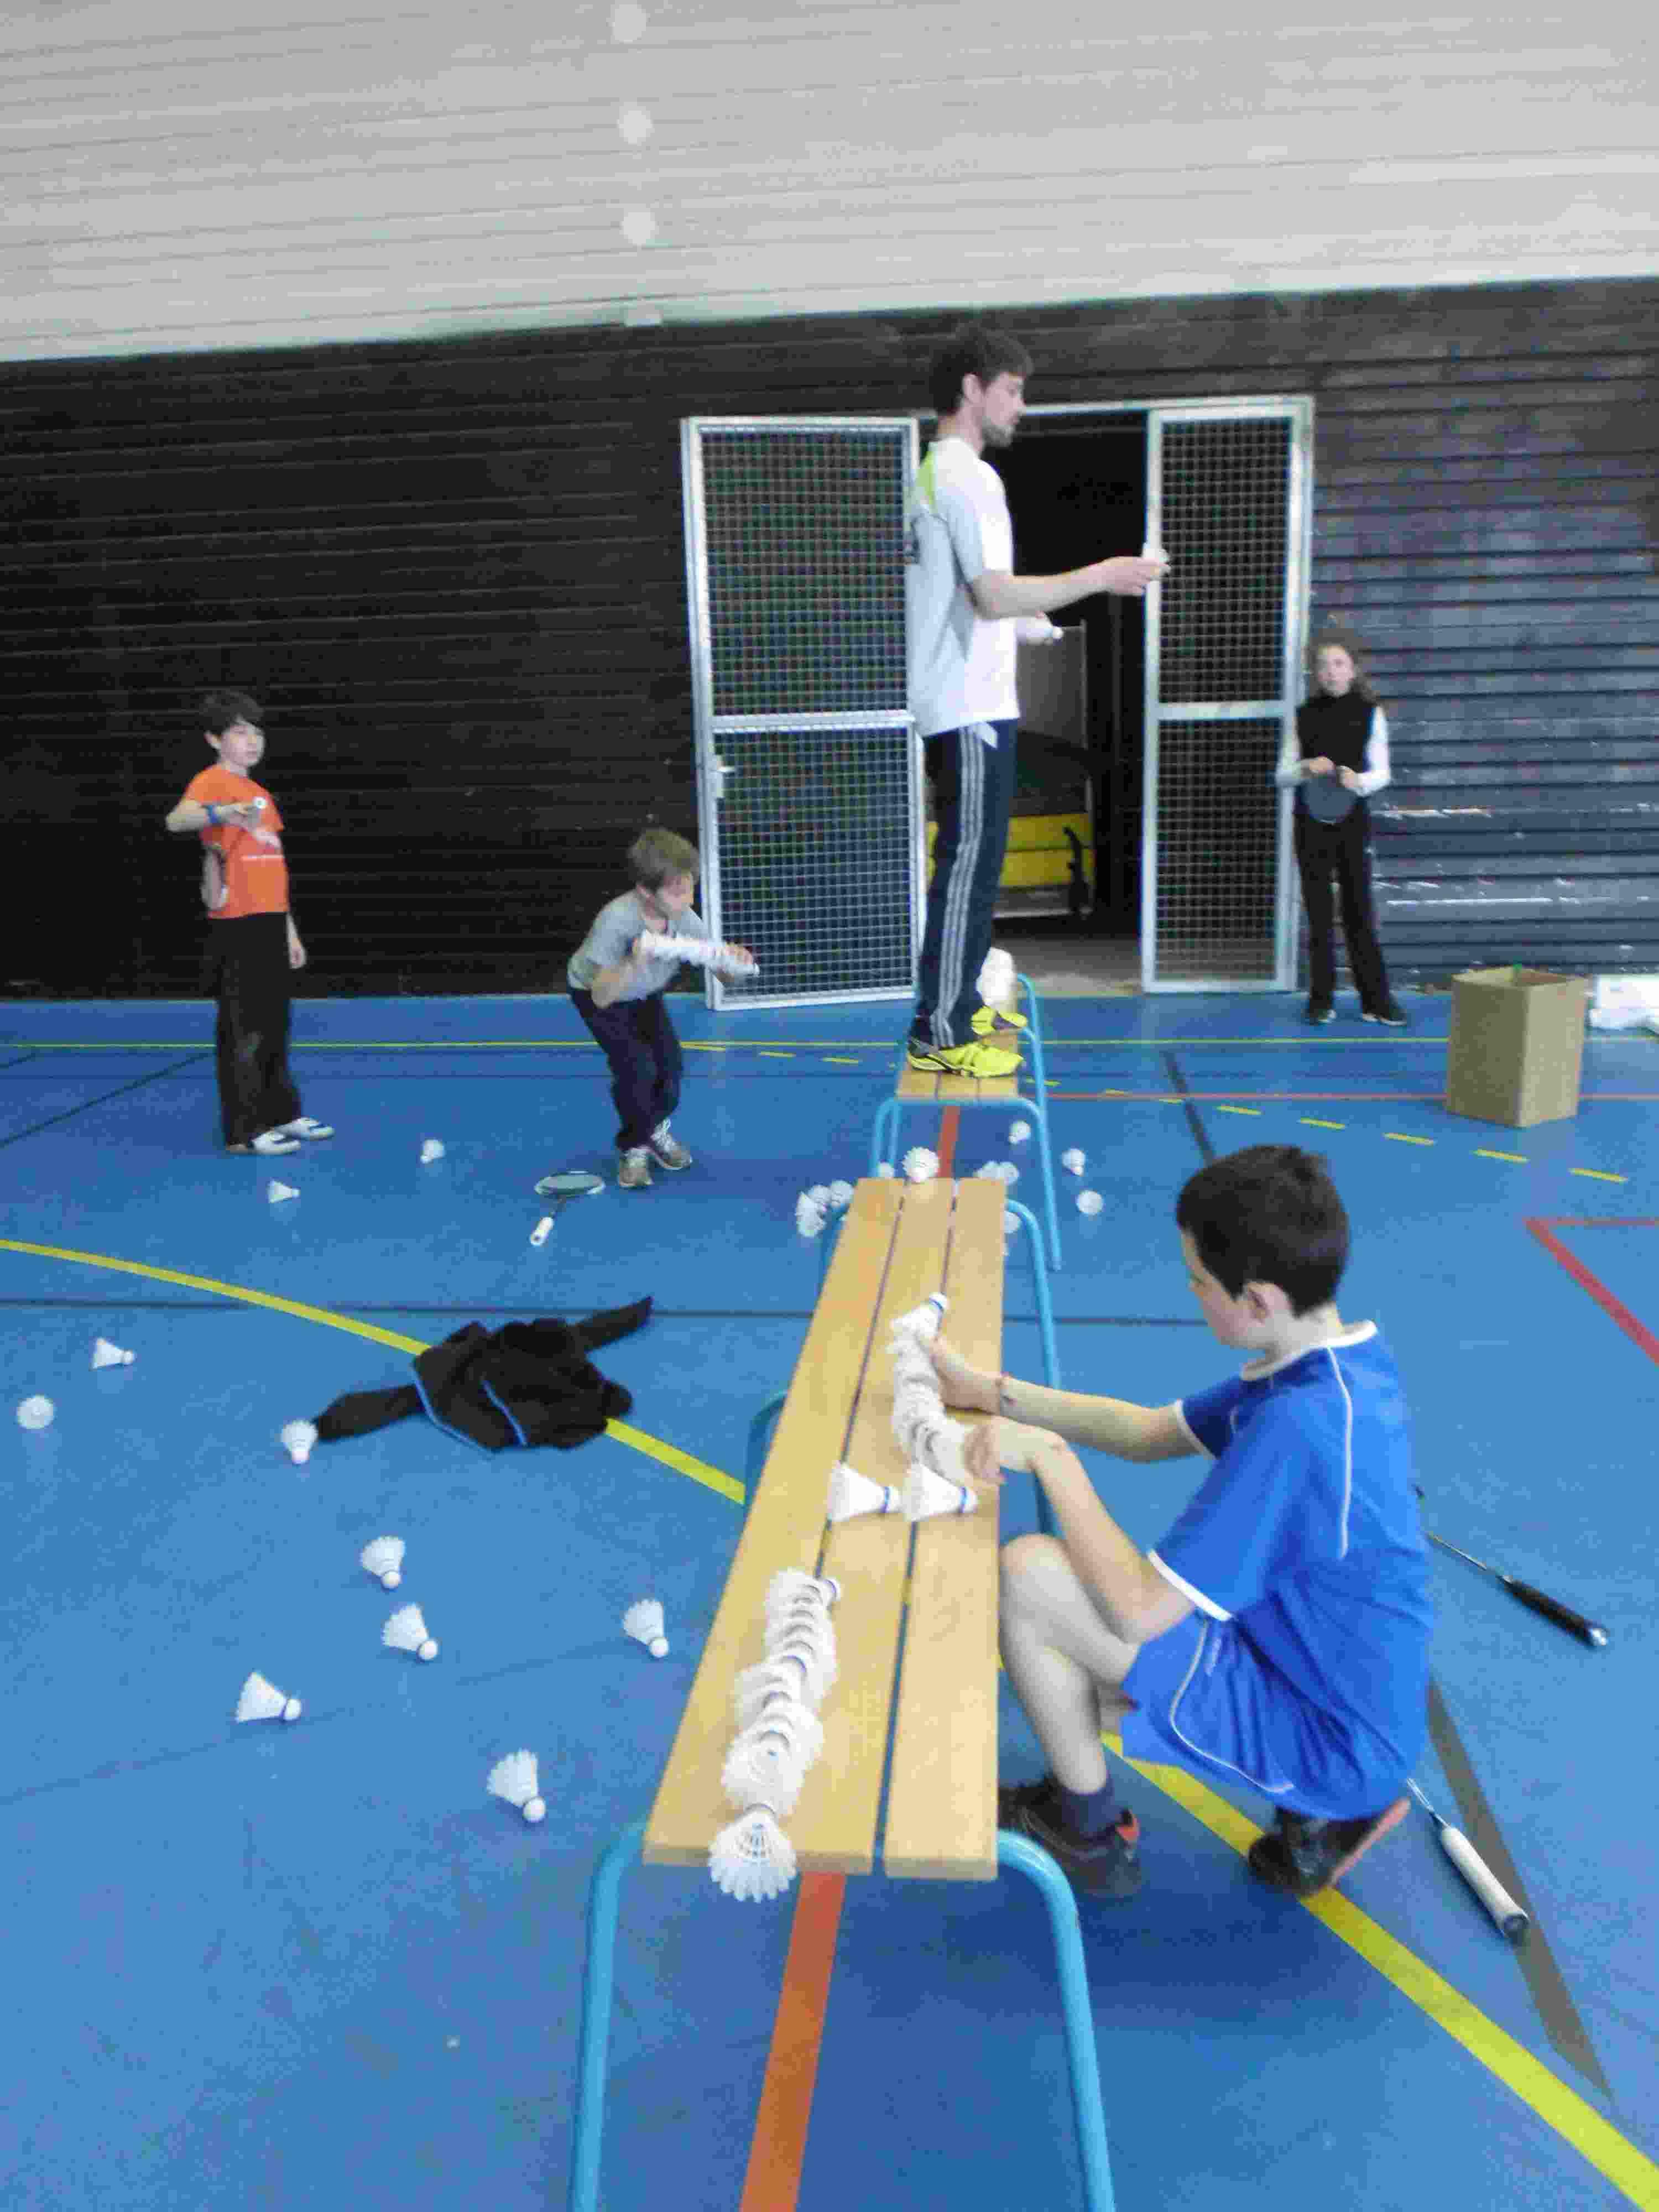 renaud-arnou-badmiton atlier-revers-badminton badminton-nuaillé